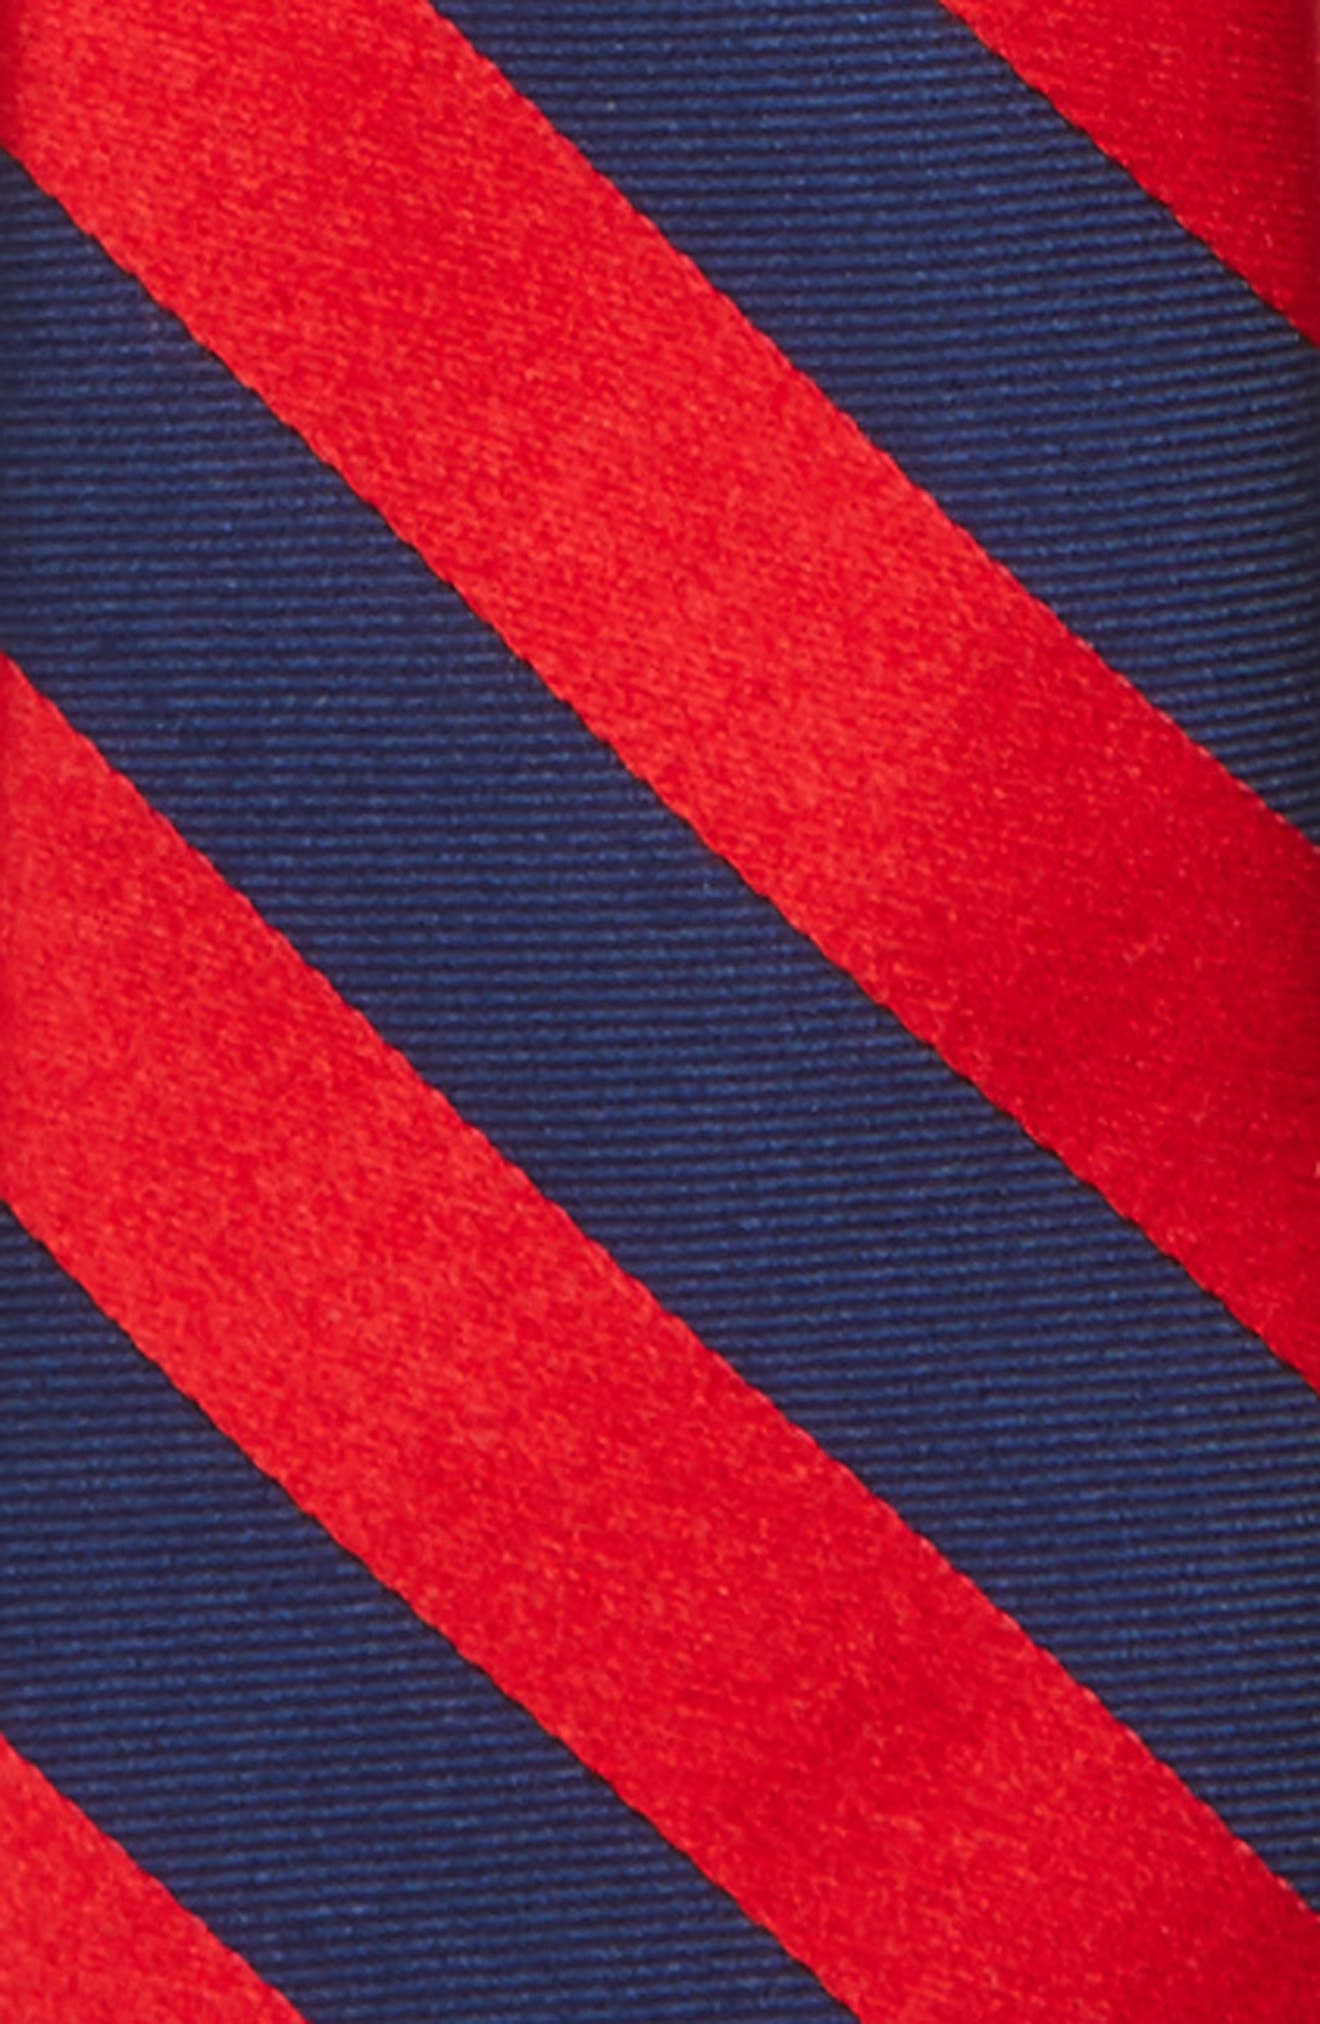 Stripe Silk Zip Tie,                             Alternate thumbnail 2, color,                             Red